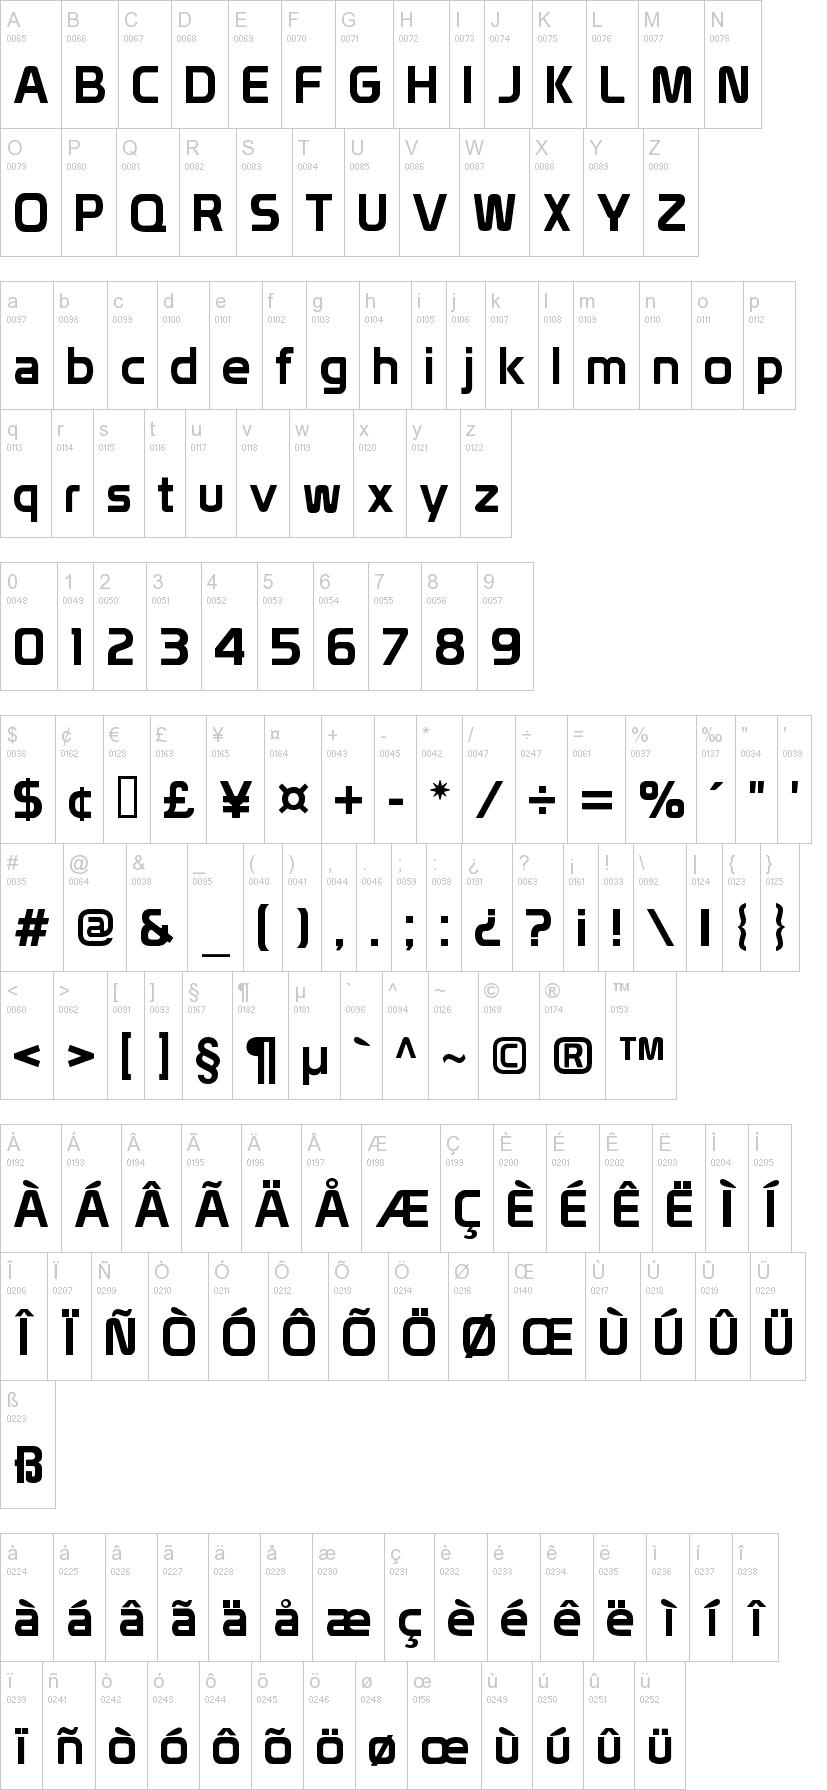 Prototype Font   dafont com